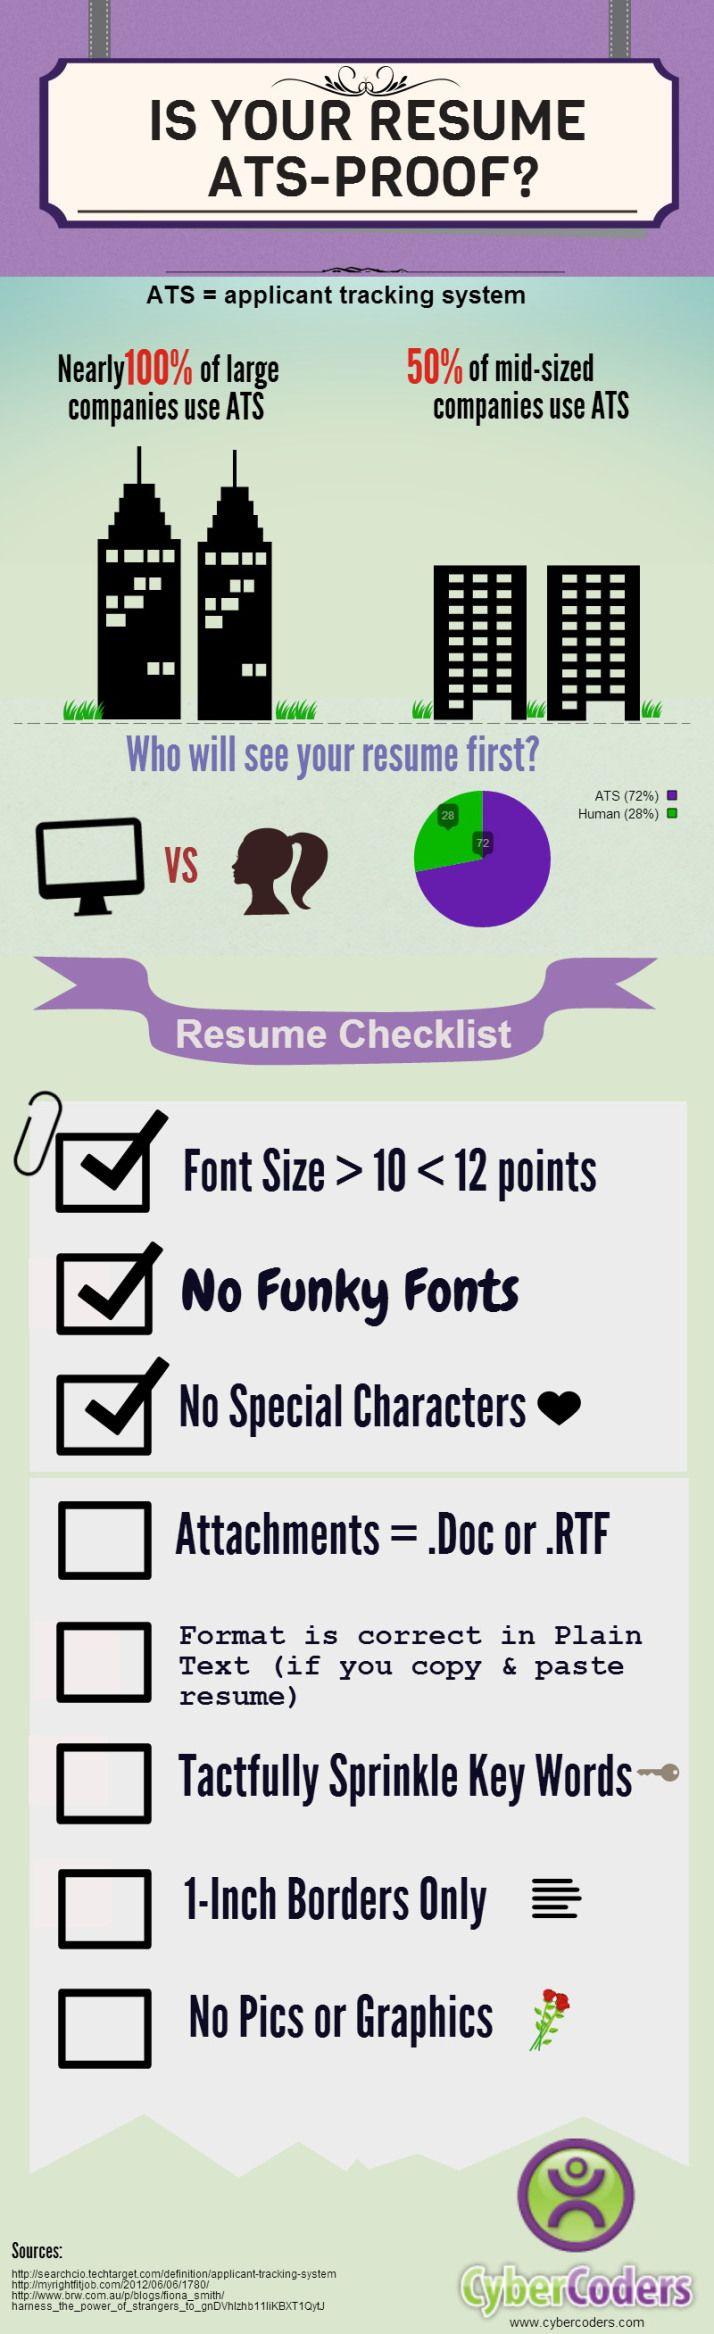 u00bftu curriculum es apto para el software ats   infografia  infographic